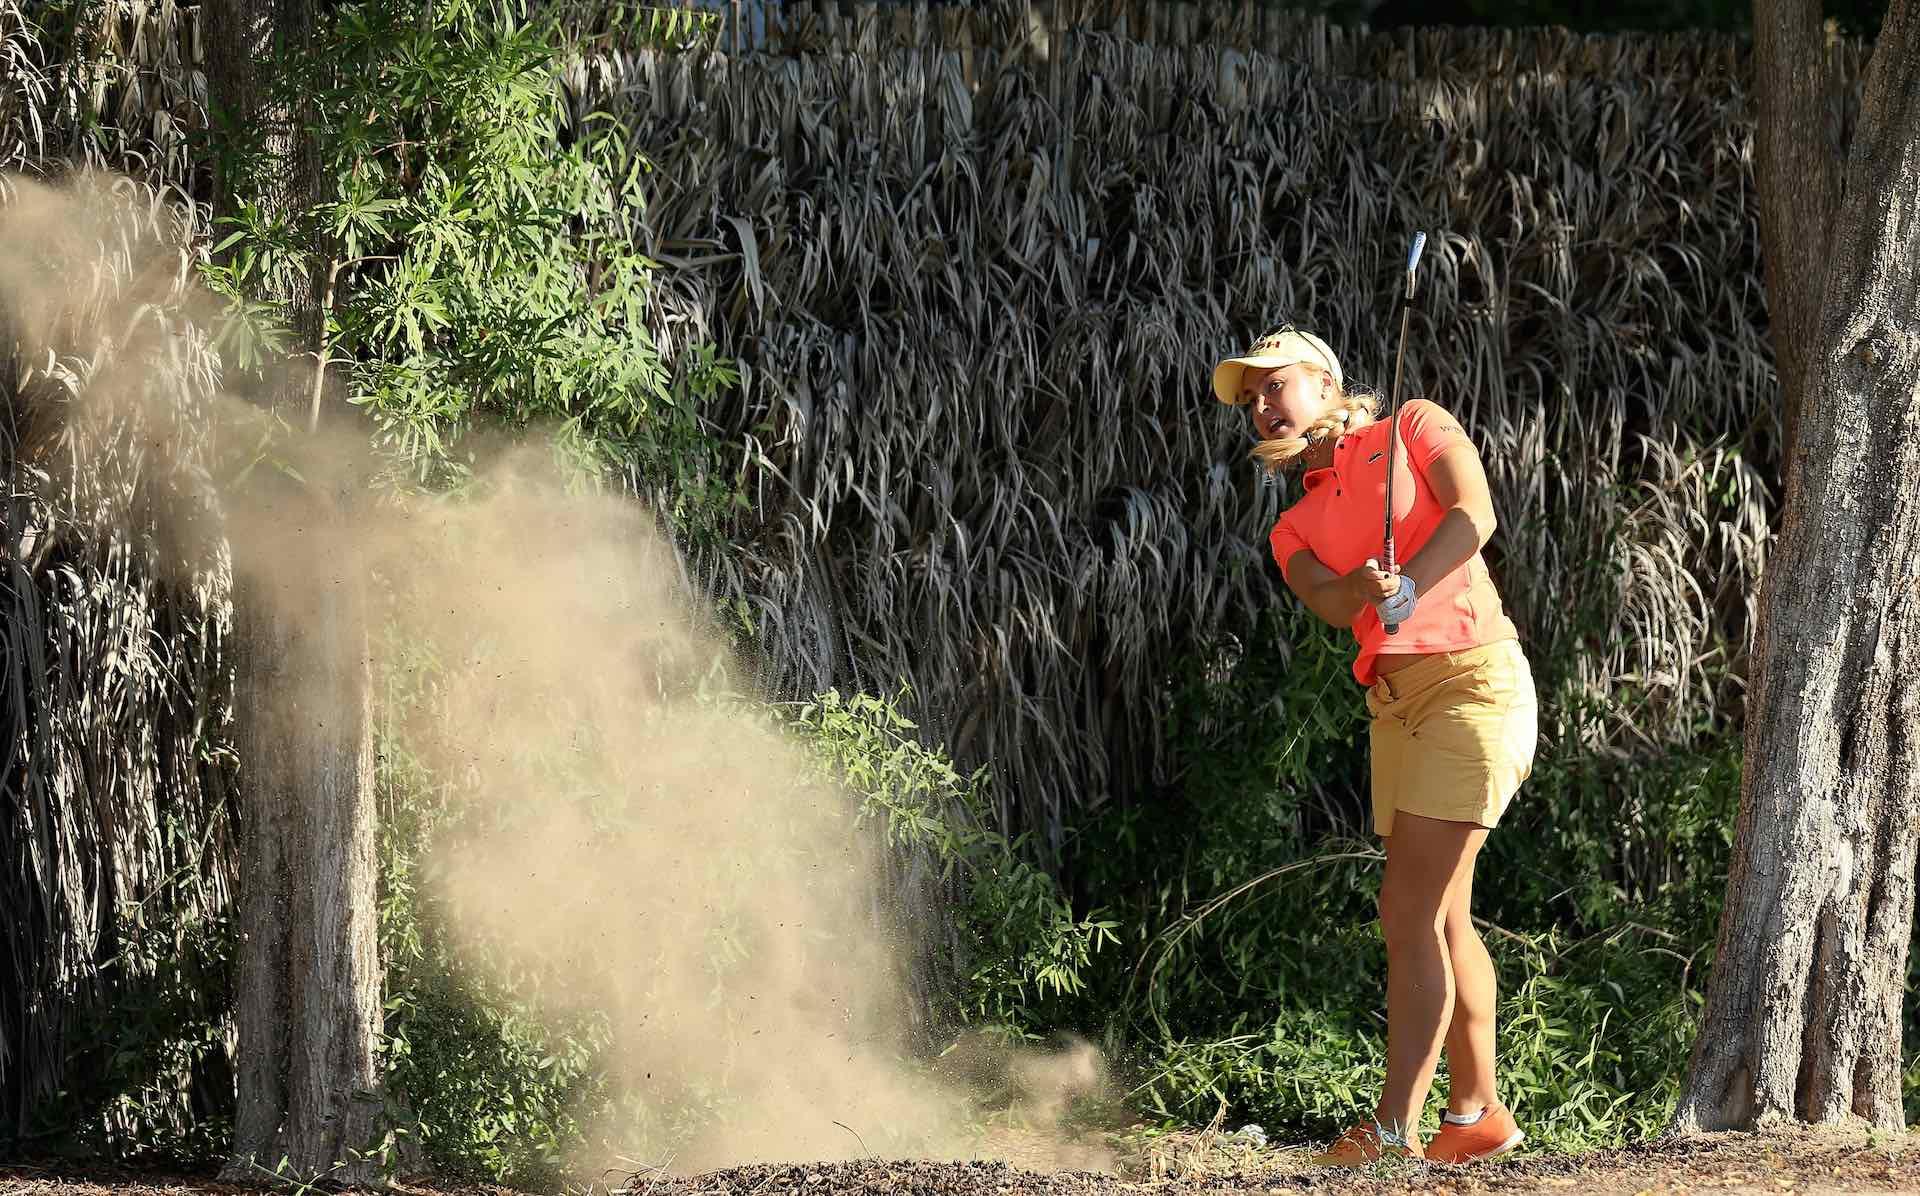 The Golf Nurse Battles Back!